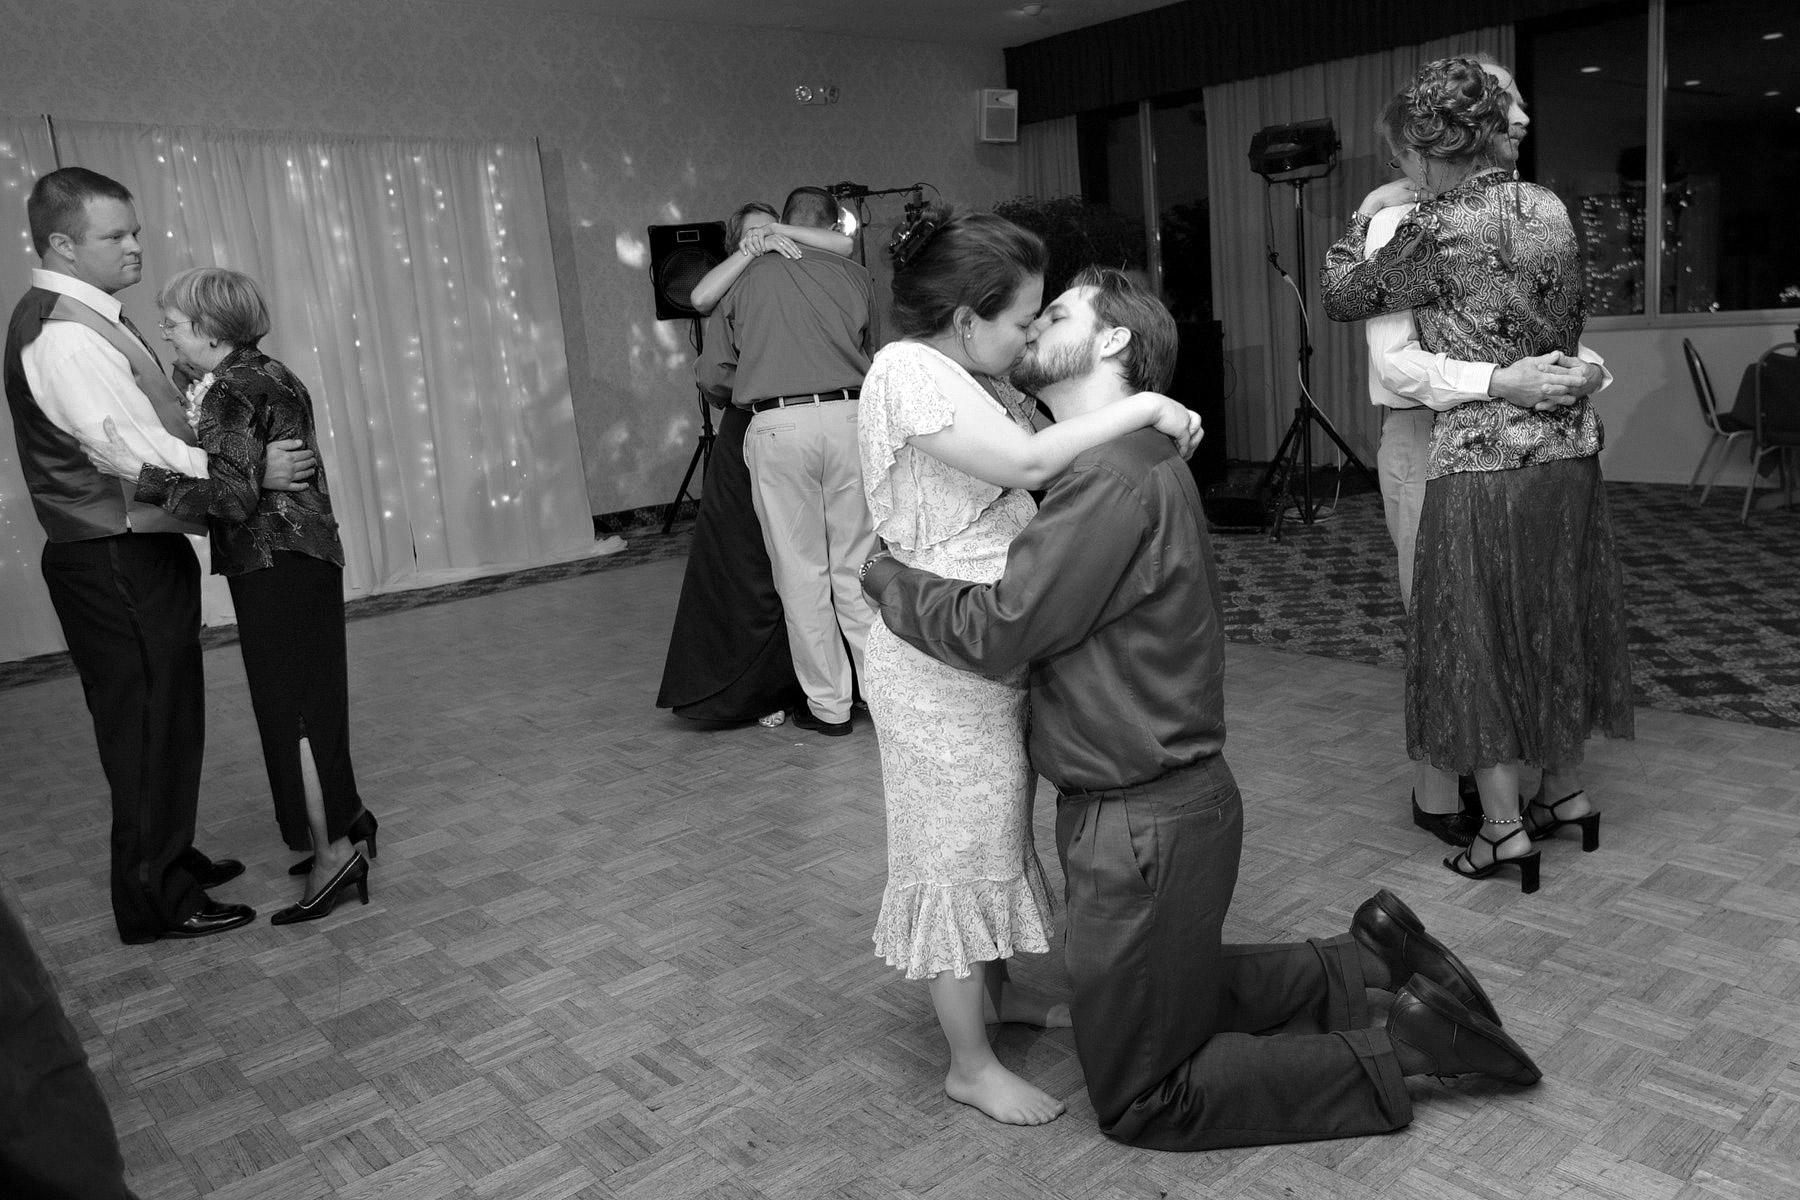 wedding-photography-saint-paul-mark-kegans-645.jpg